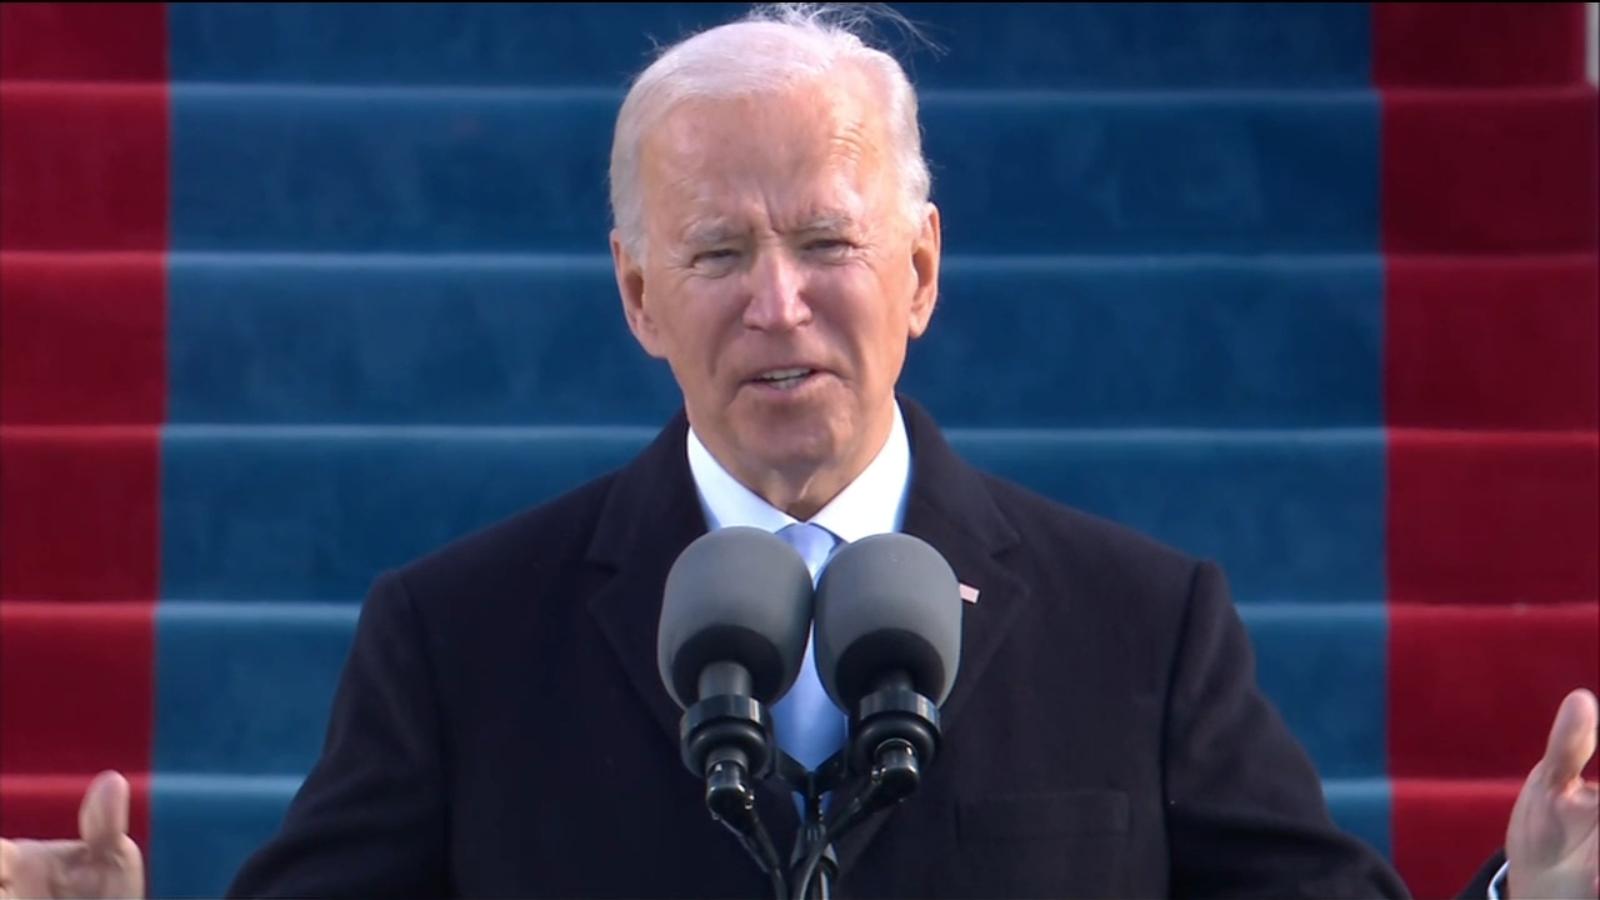 abc7chicago.com: Biden Presidential Inauguration: Illinois politicians, leaders, unions congratulate new president, Vice President Kamala Harris